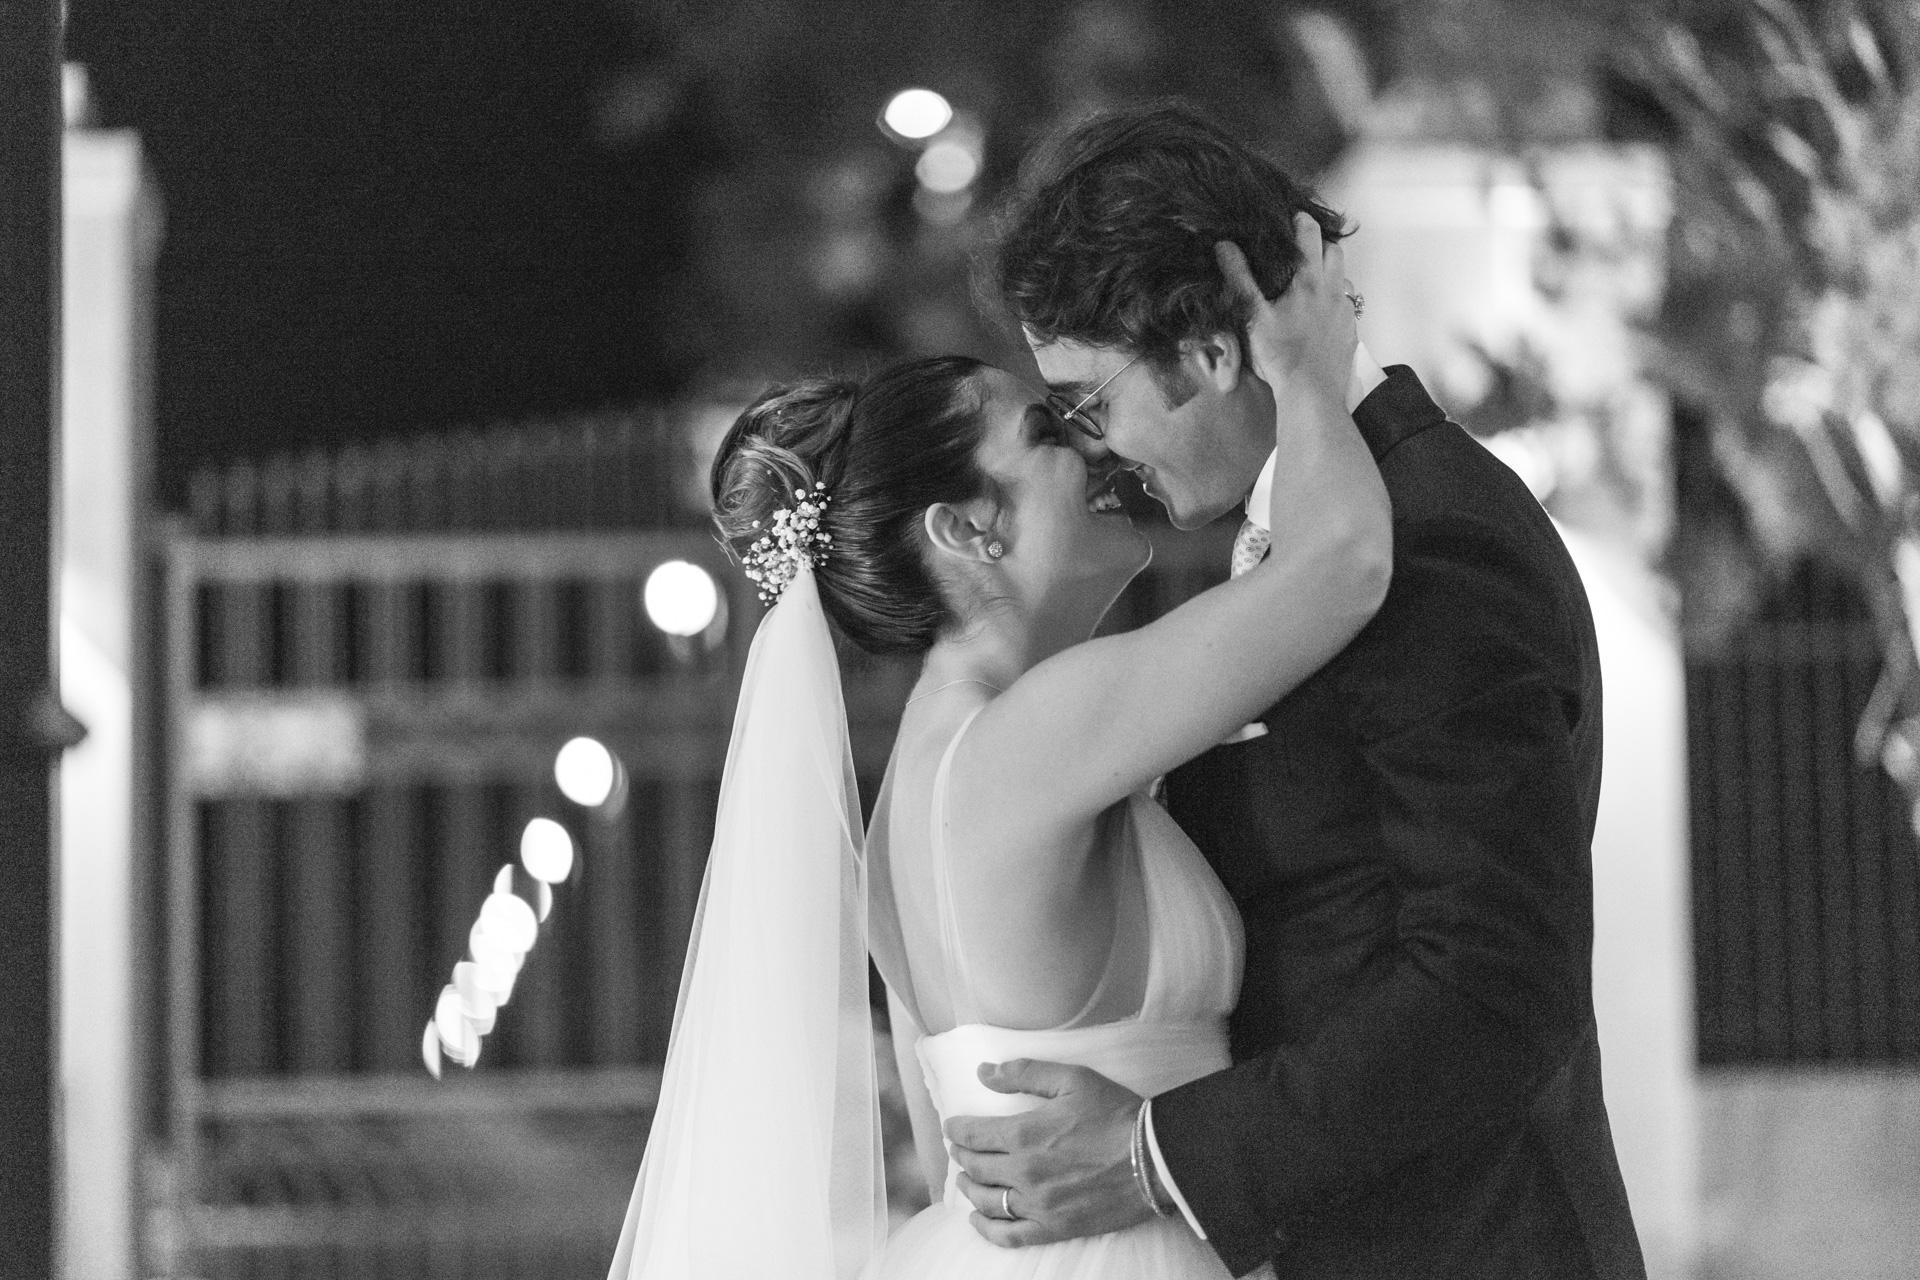 merafina photographer alfonso merafina fotografo wedding matrimonio andria francesca e antonio (22)